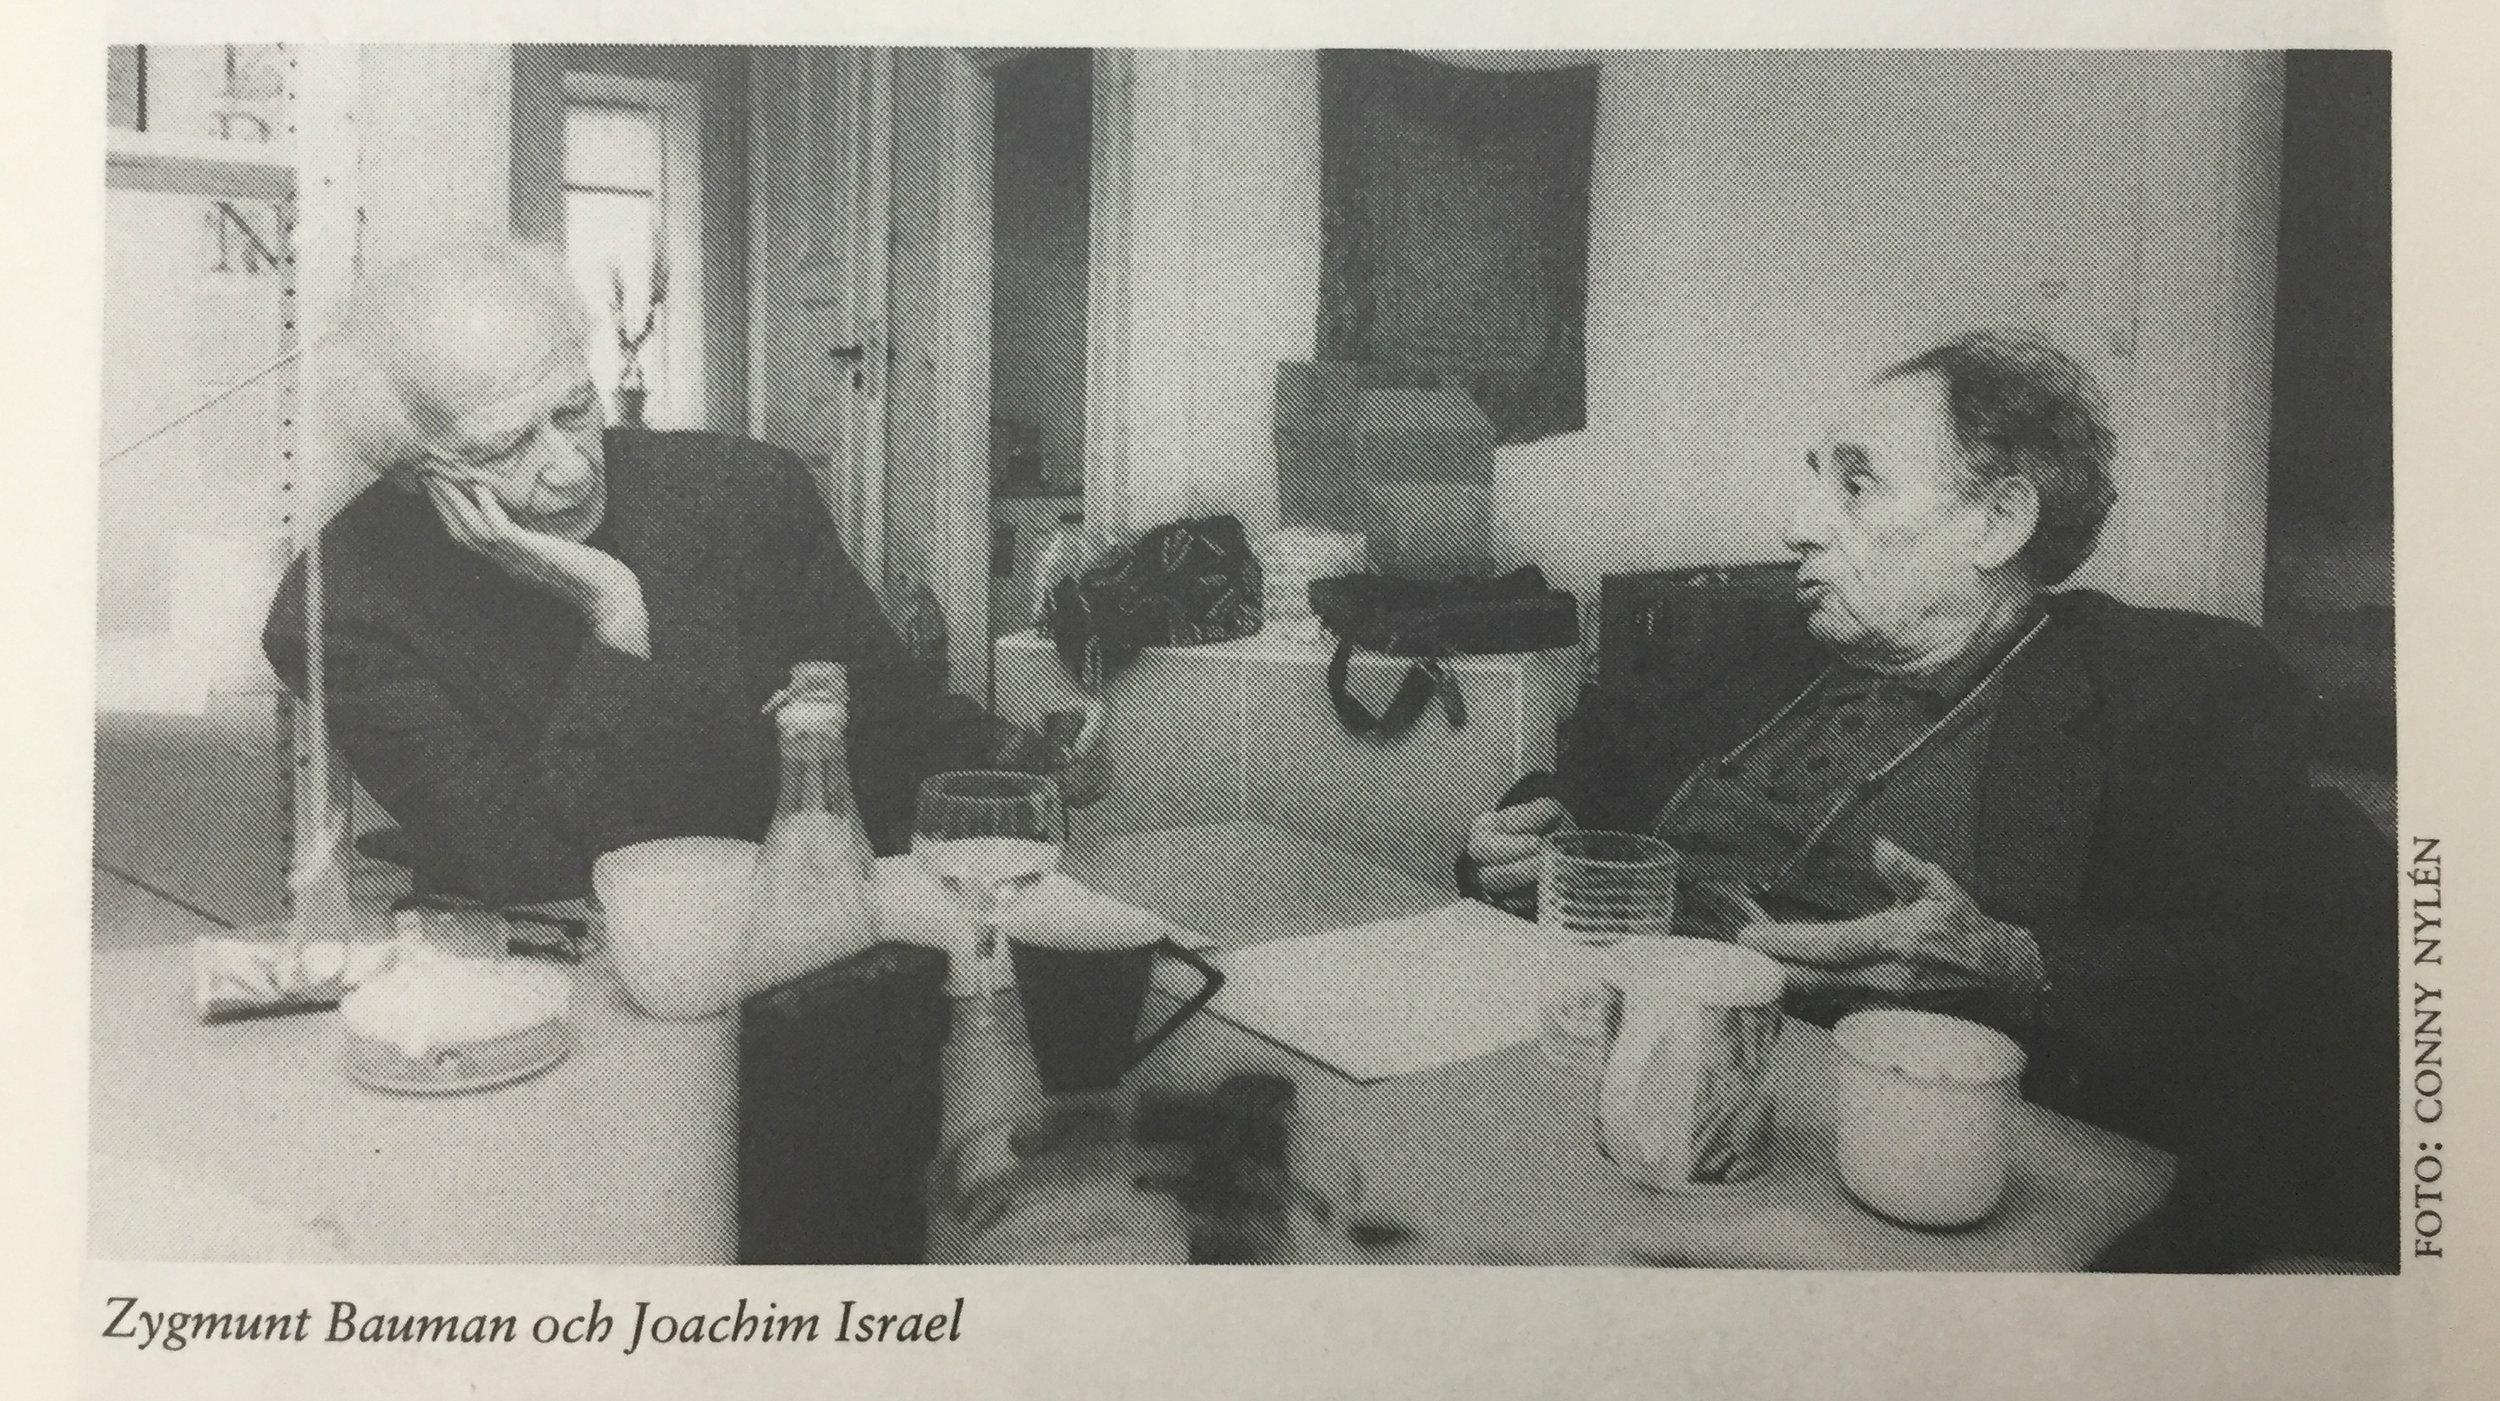 Zygmunt Bauman och Joachim Israel. Foto: Conny Nylén.